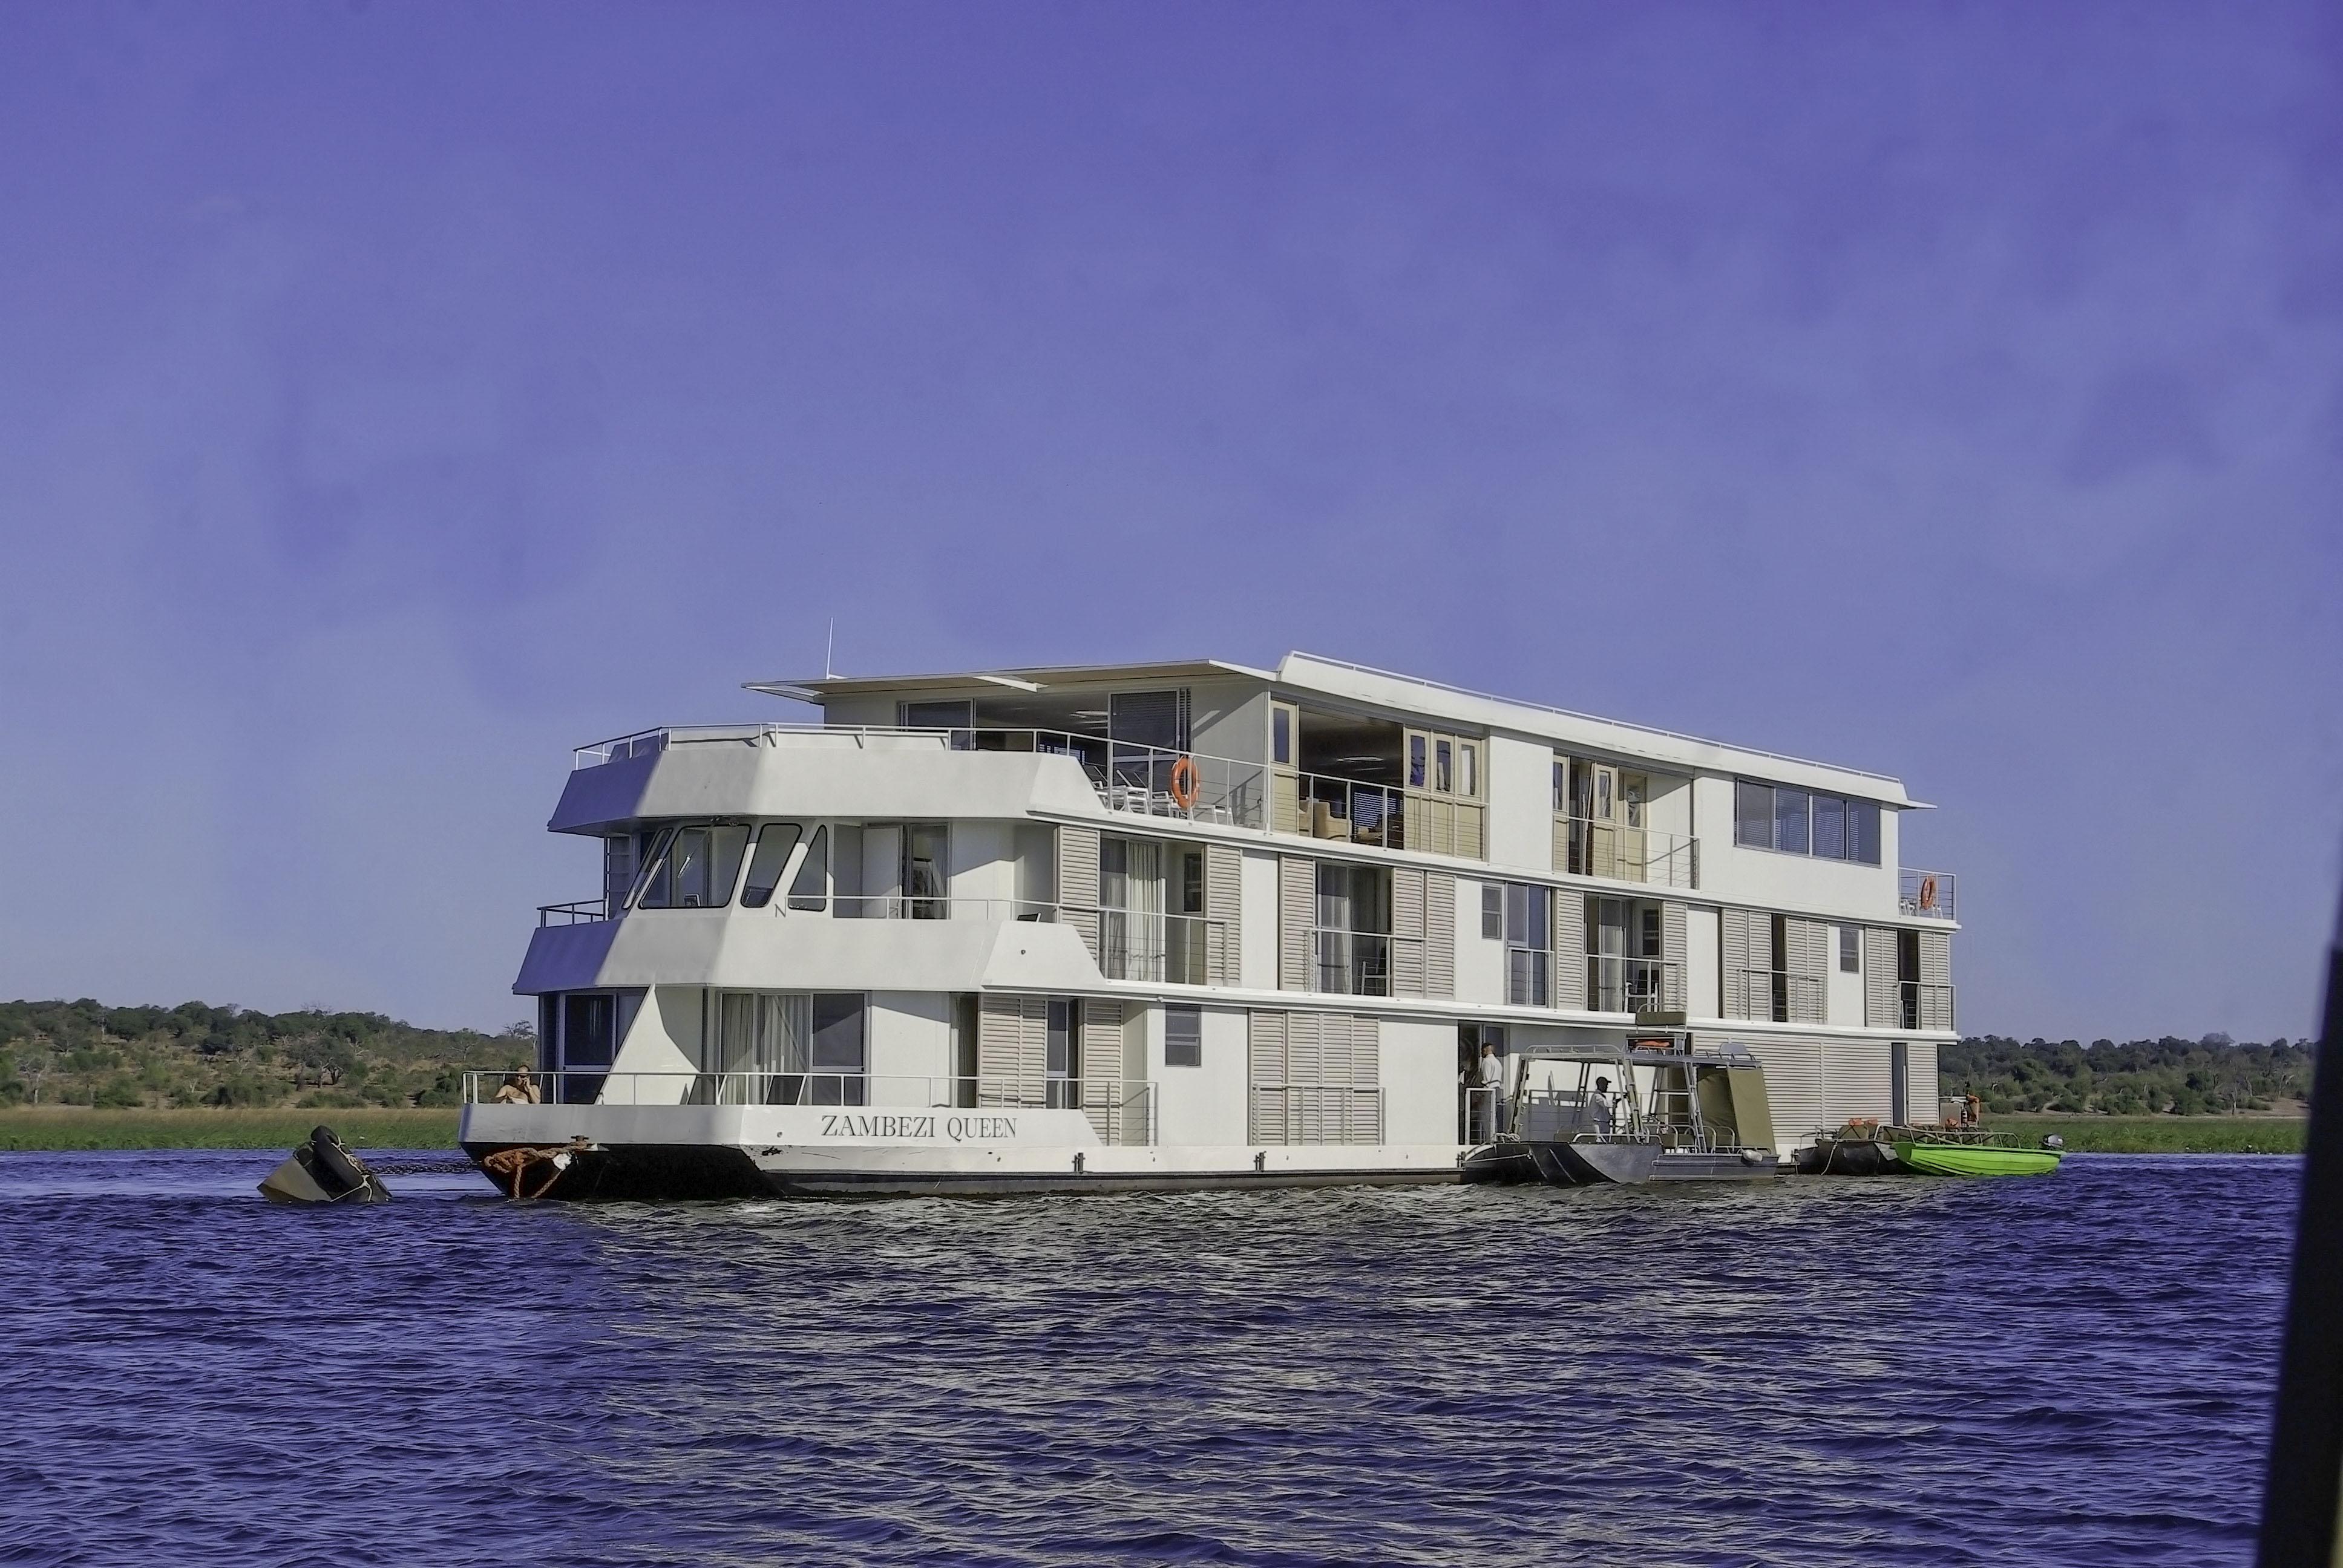 Grands Espaces - Zambezi Queen